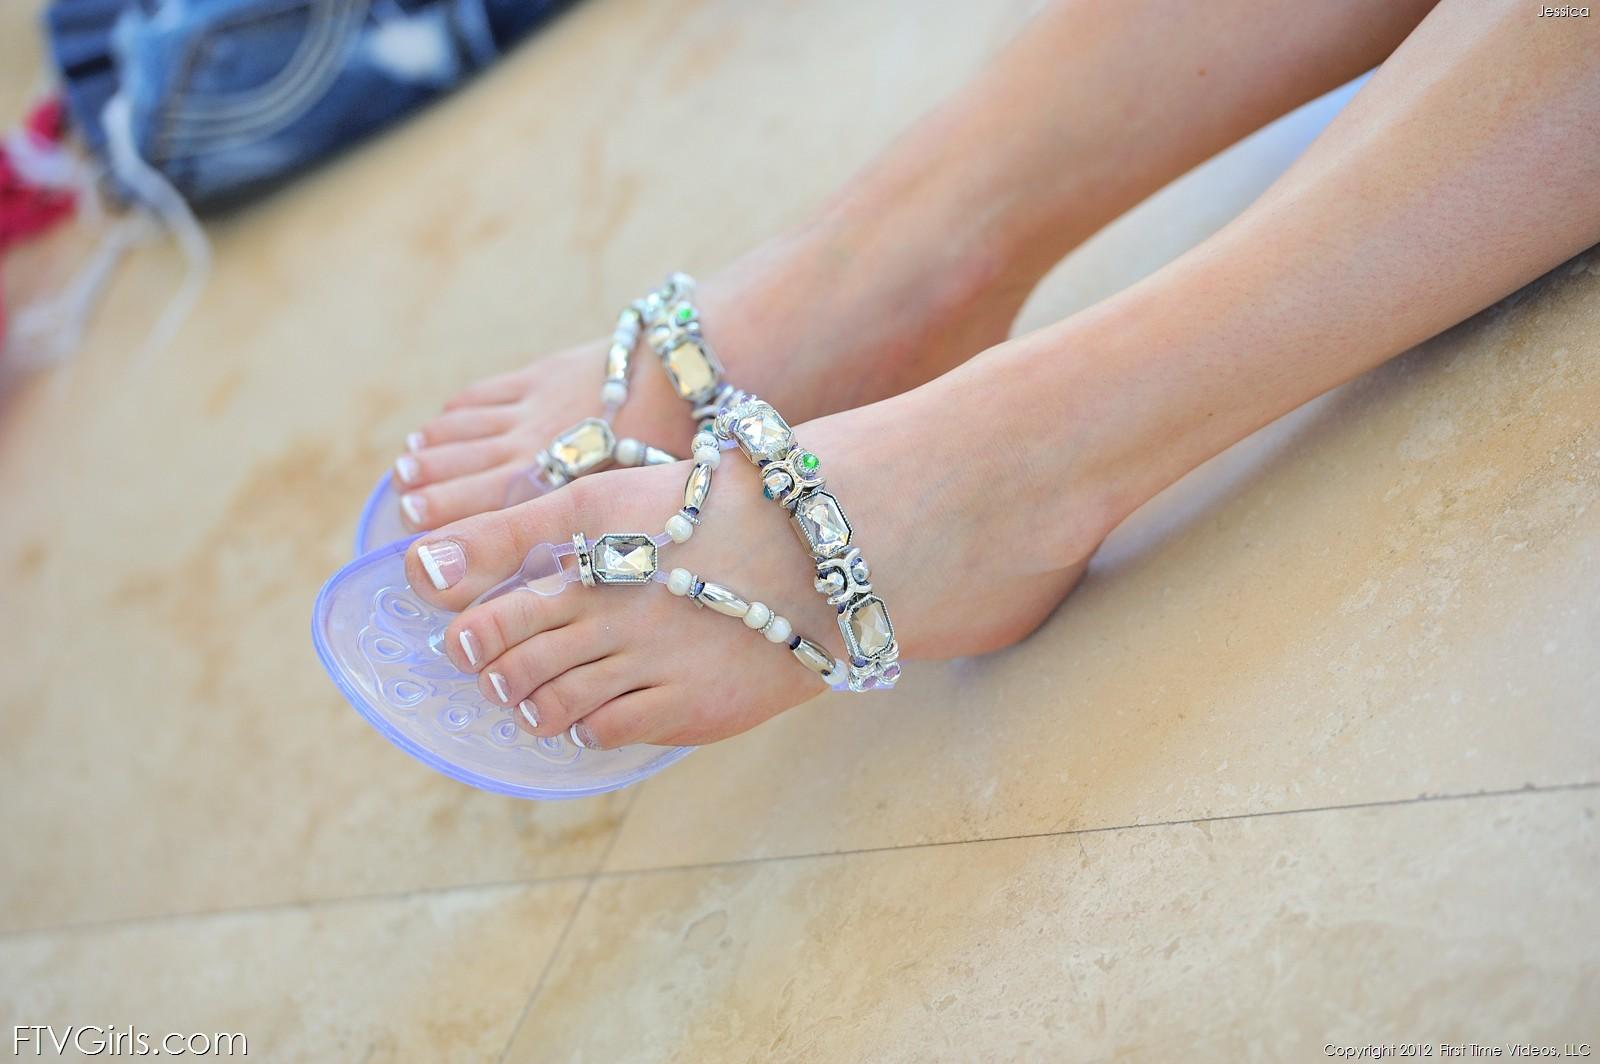 mia malkova feet pics